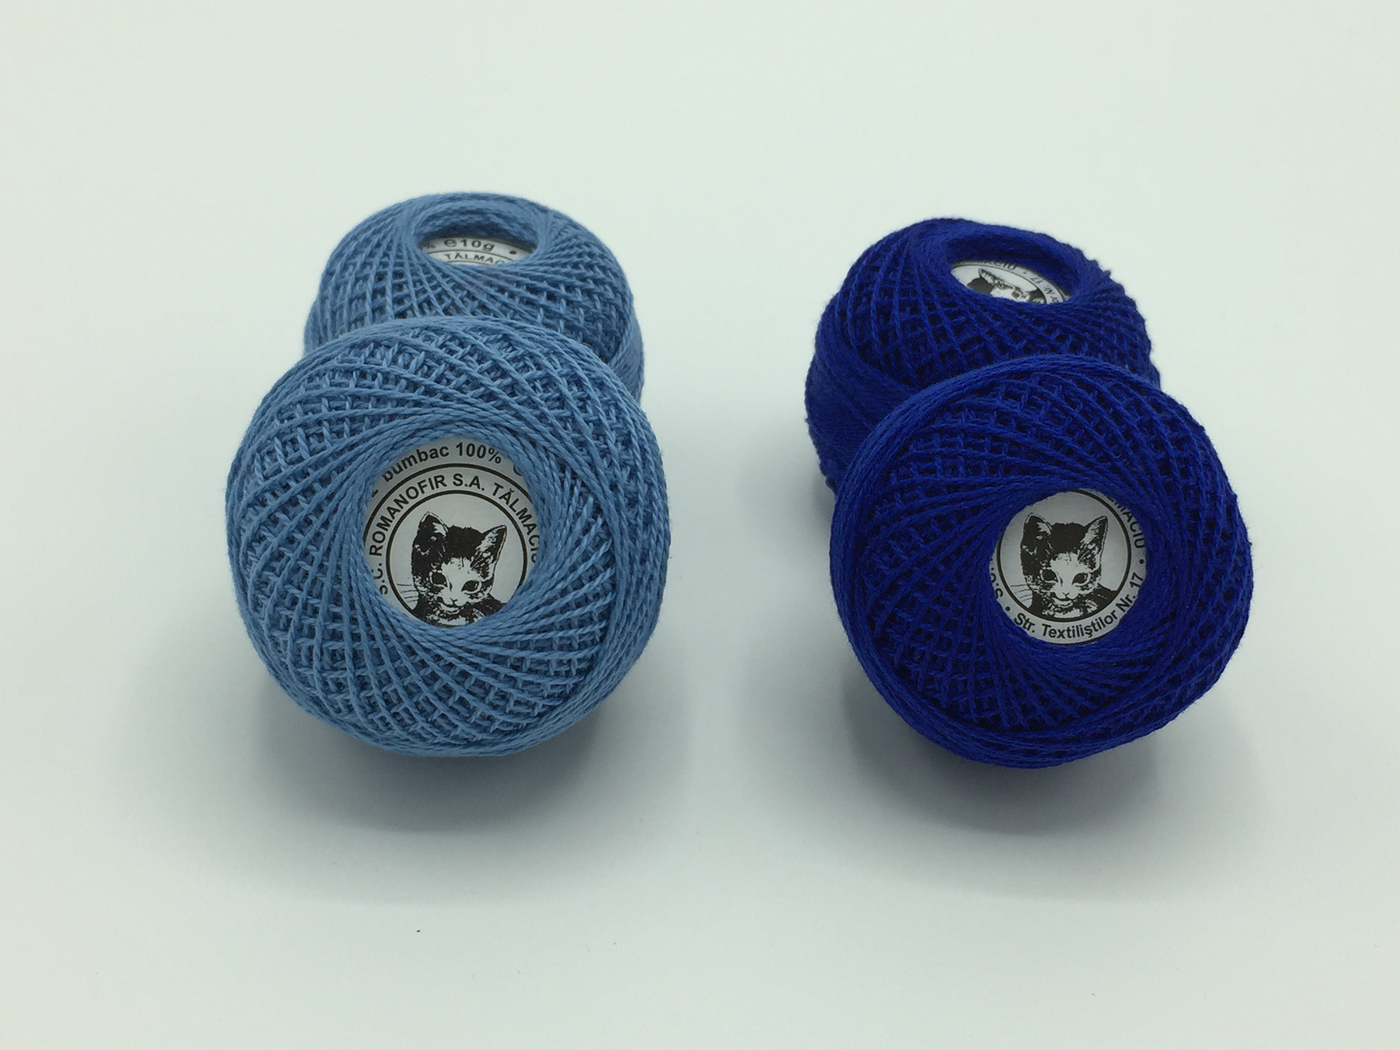 Ata cotton-perle 100% bumbac - Albastru - 10 gheme - Romanofir 20/2